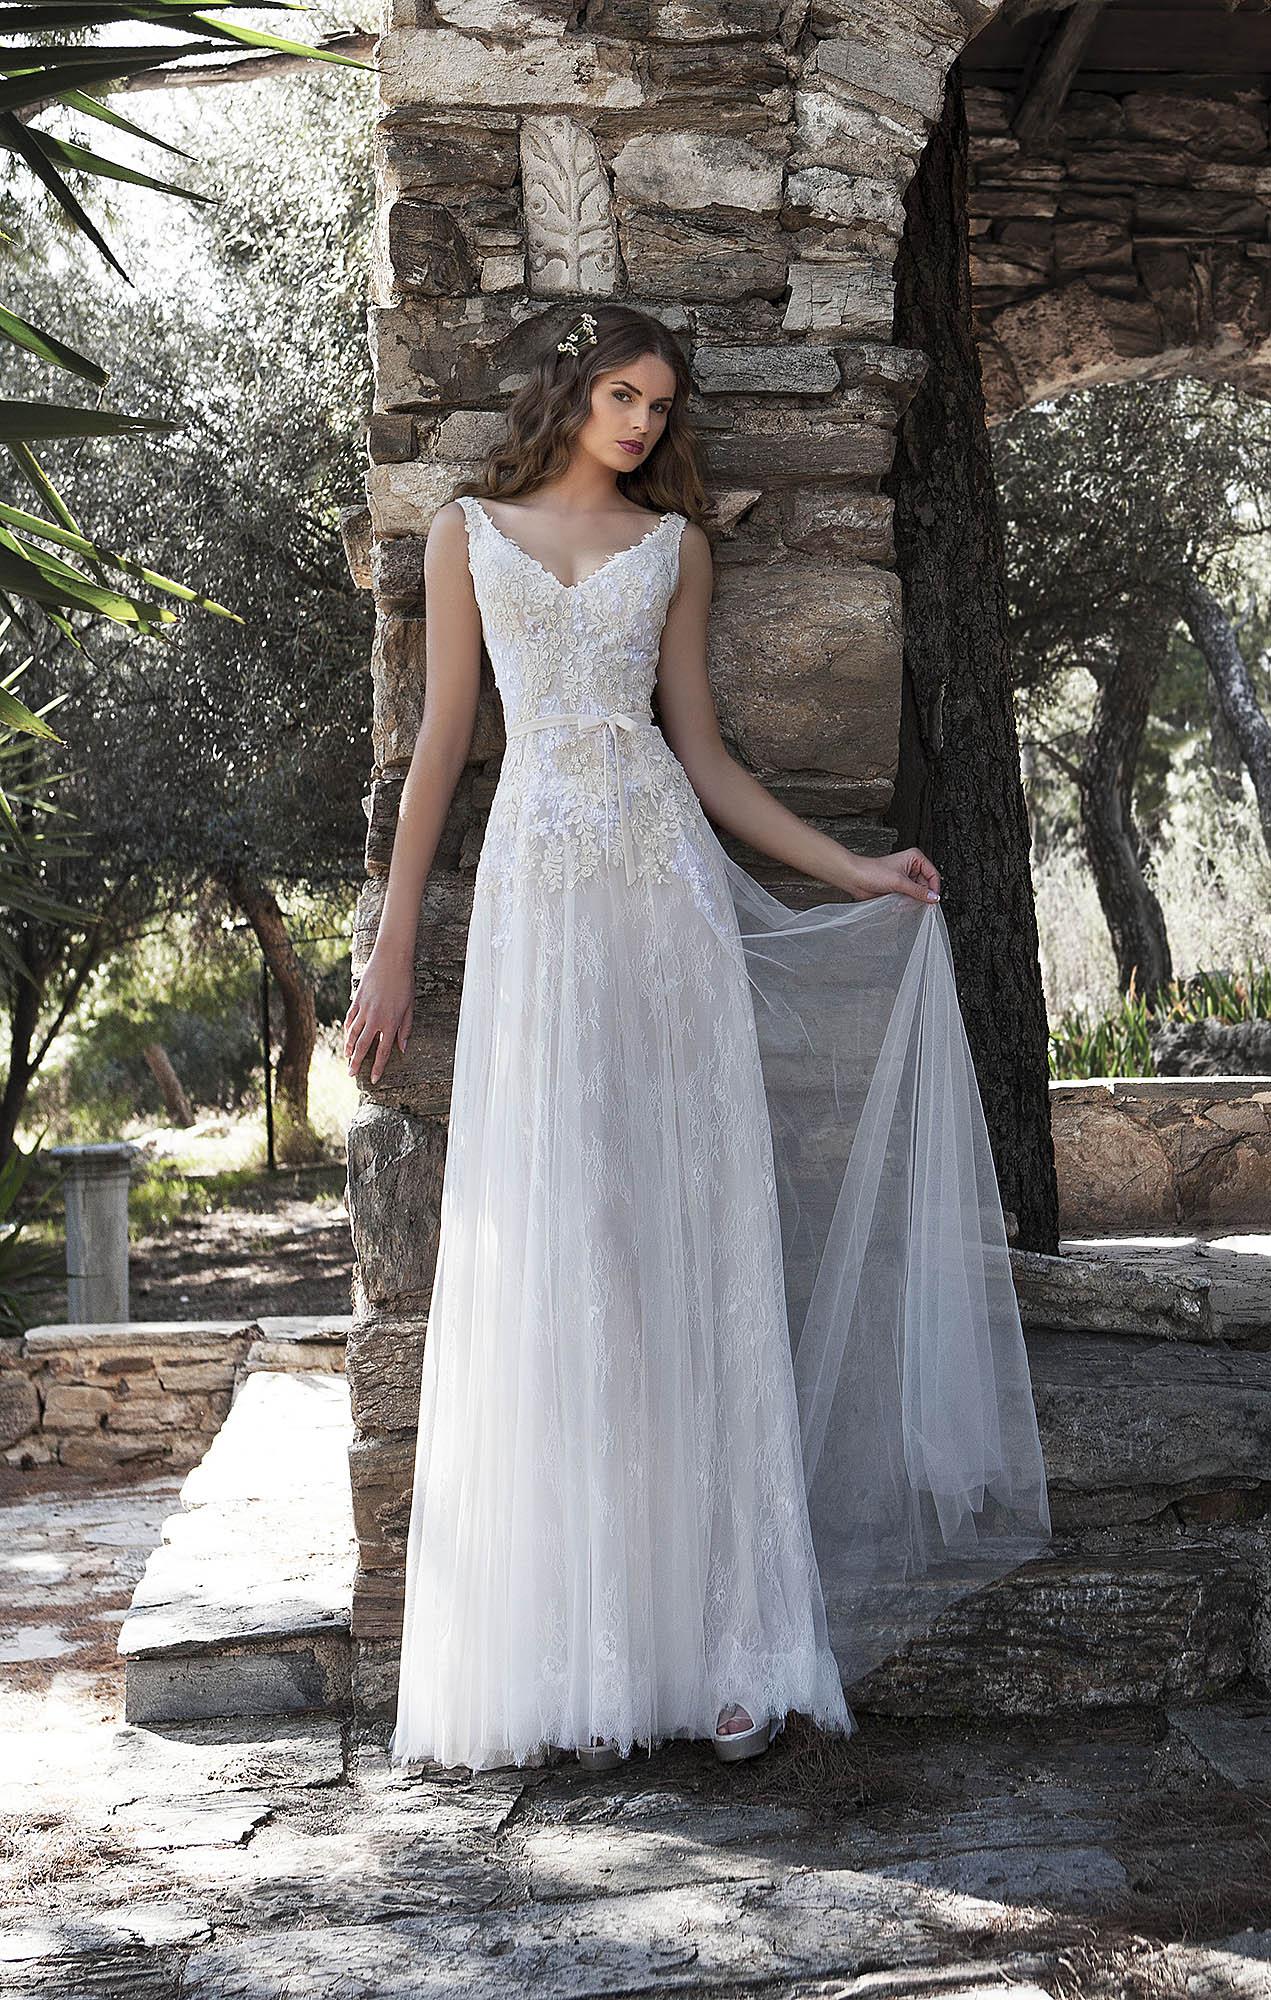 762795c75d47 Νυφικό Orsalia - Yianna Couture